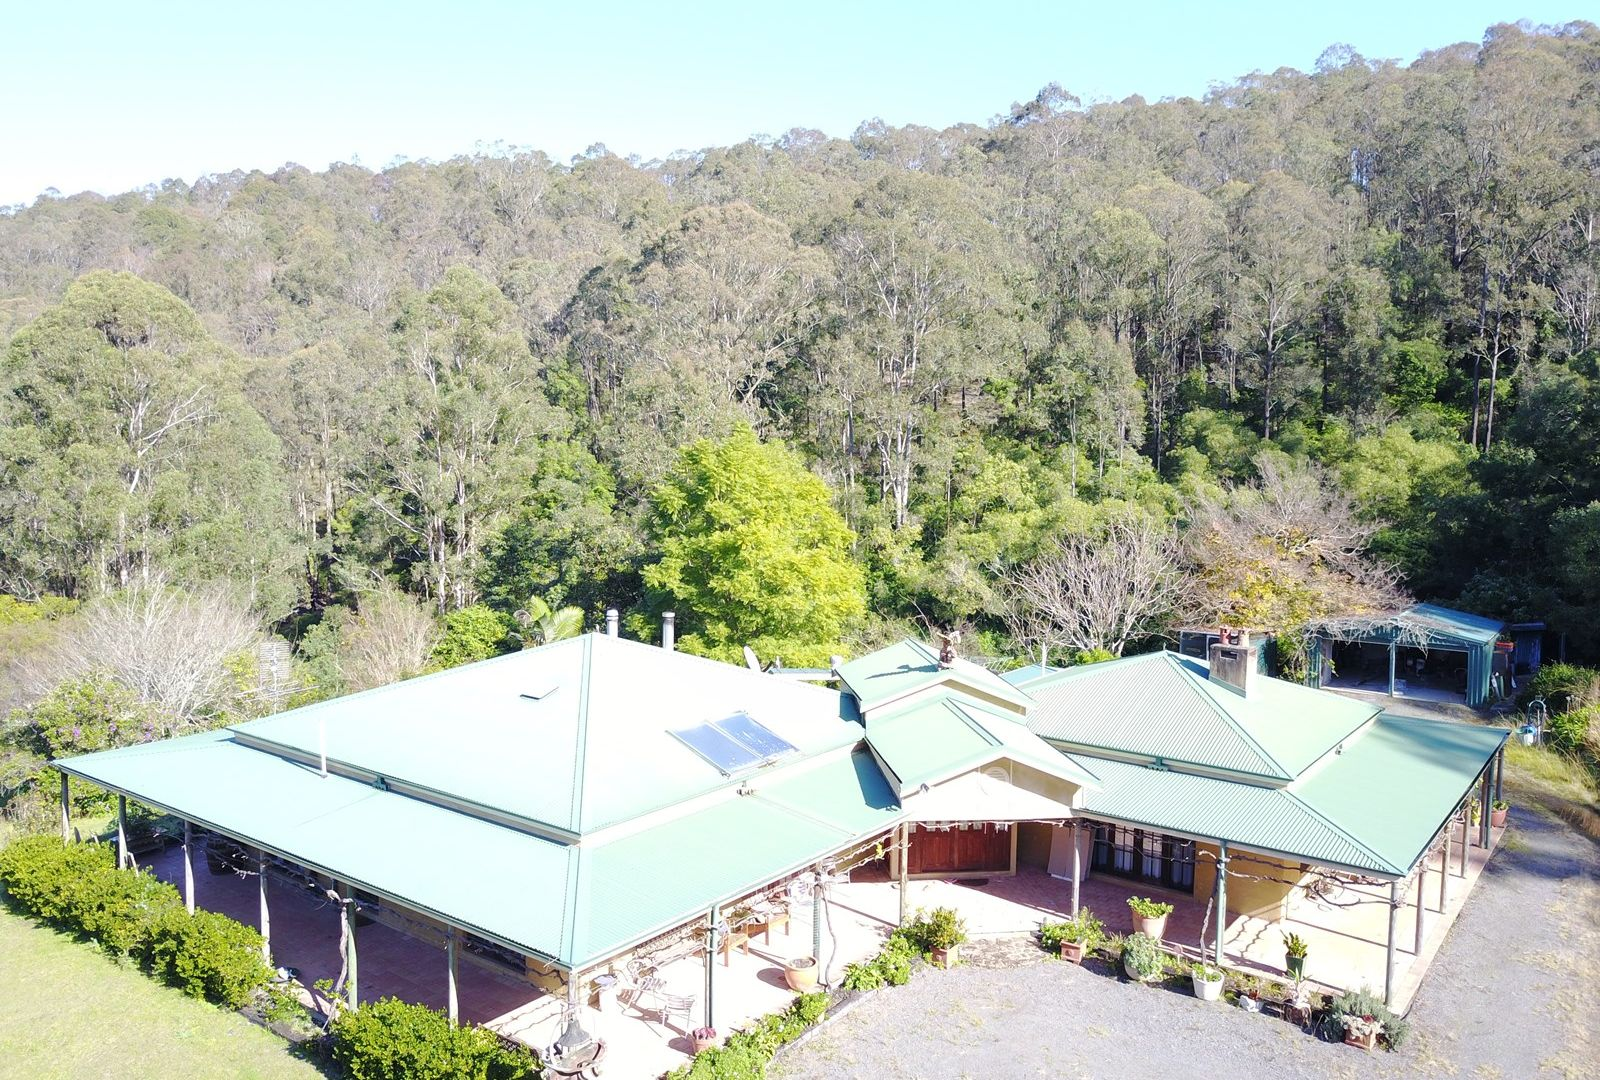 710 Black Camp Road, CAMBRA Via, Dungog NSW 2420, Image 1